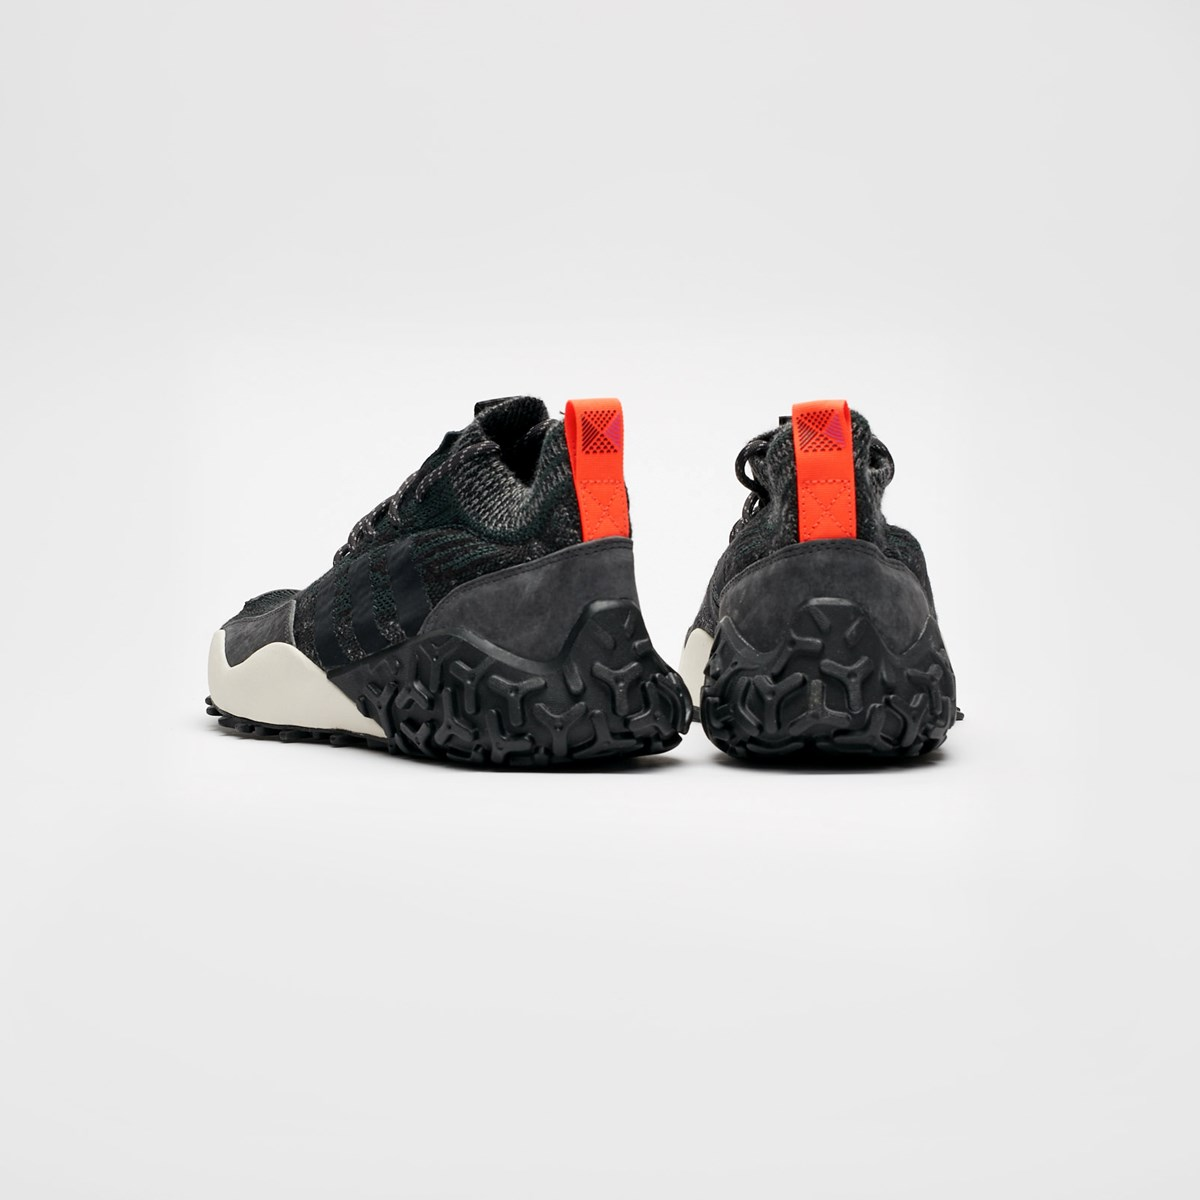 timeless design 5f30a b4c79 adidas F2 TR PK - Aq1109 - Sneakersnstuff  sneakers  streetwear online  since 1999